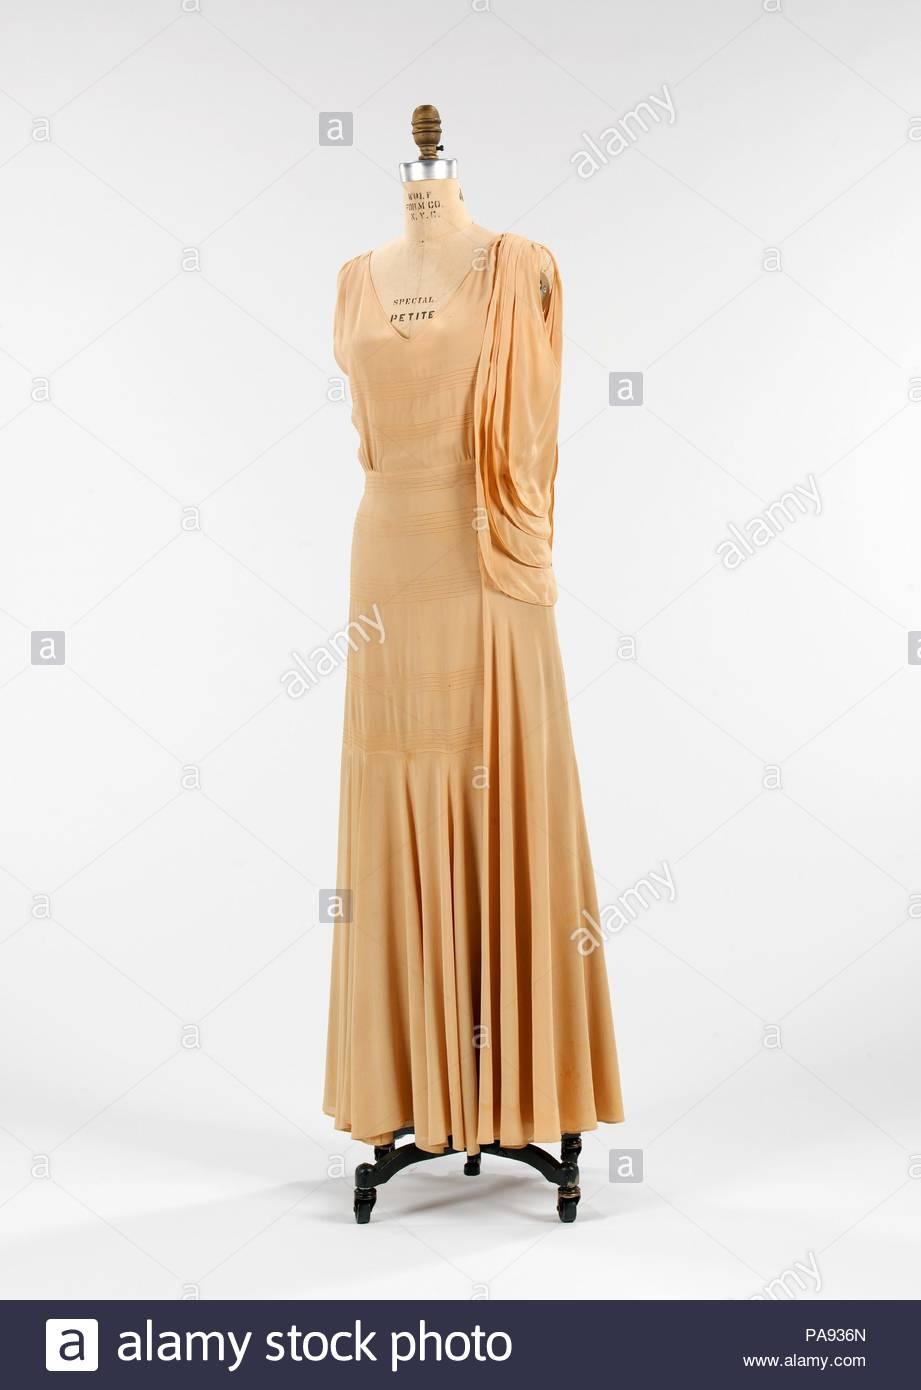 La petite robe de paul samenvatting